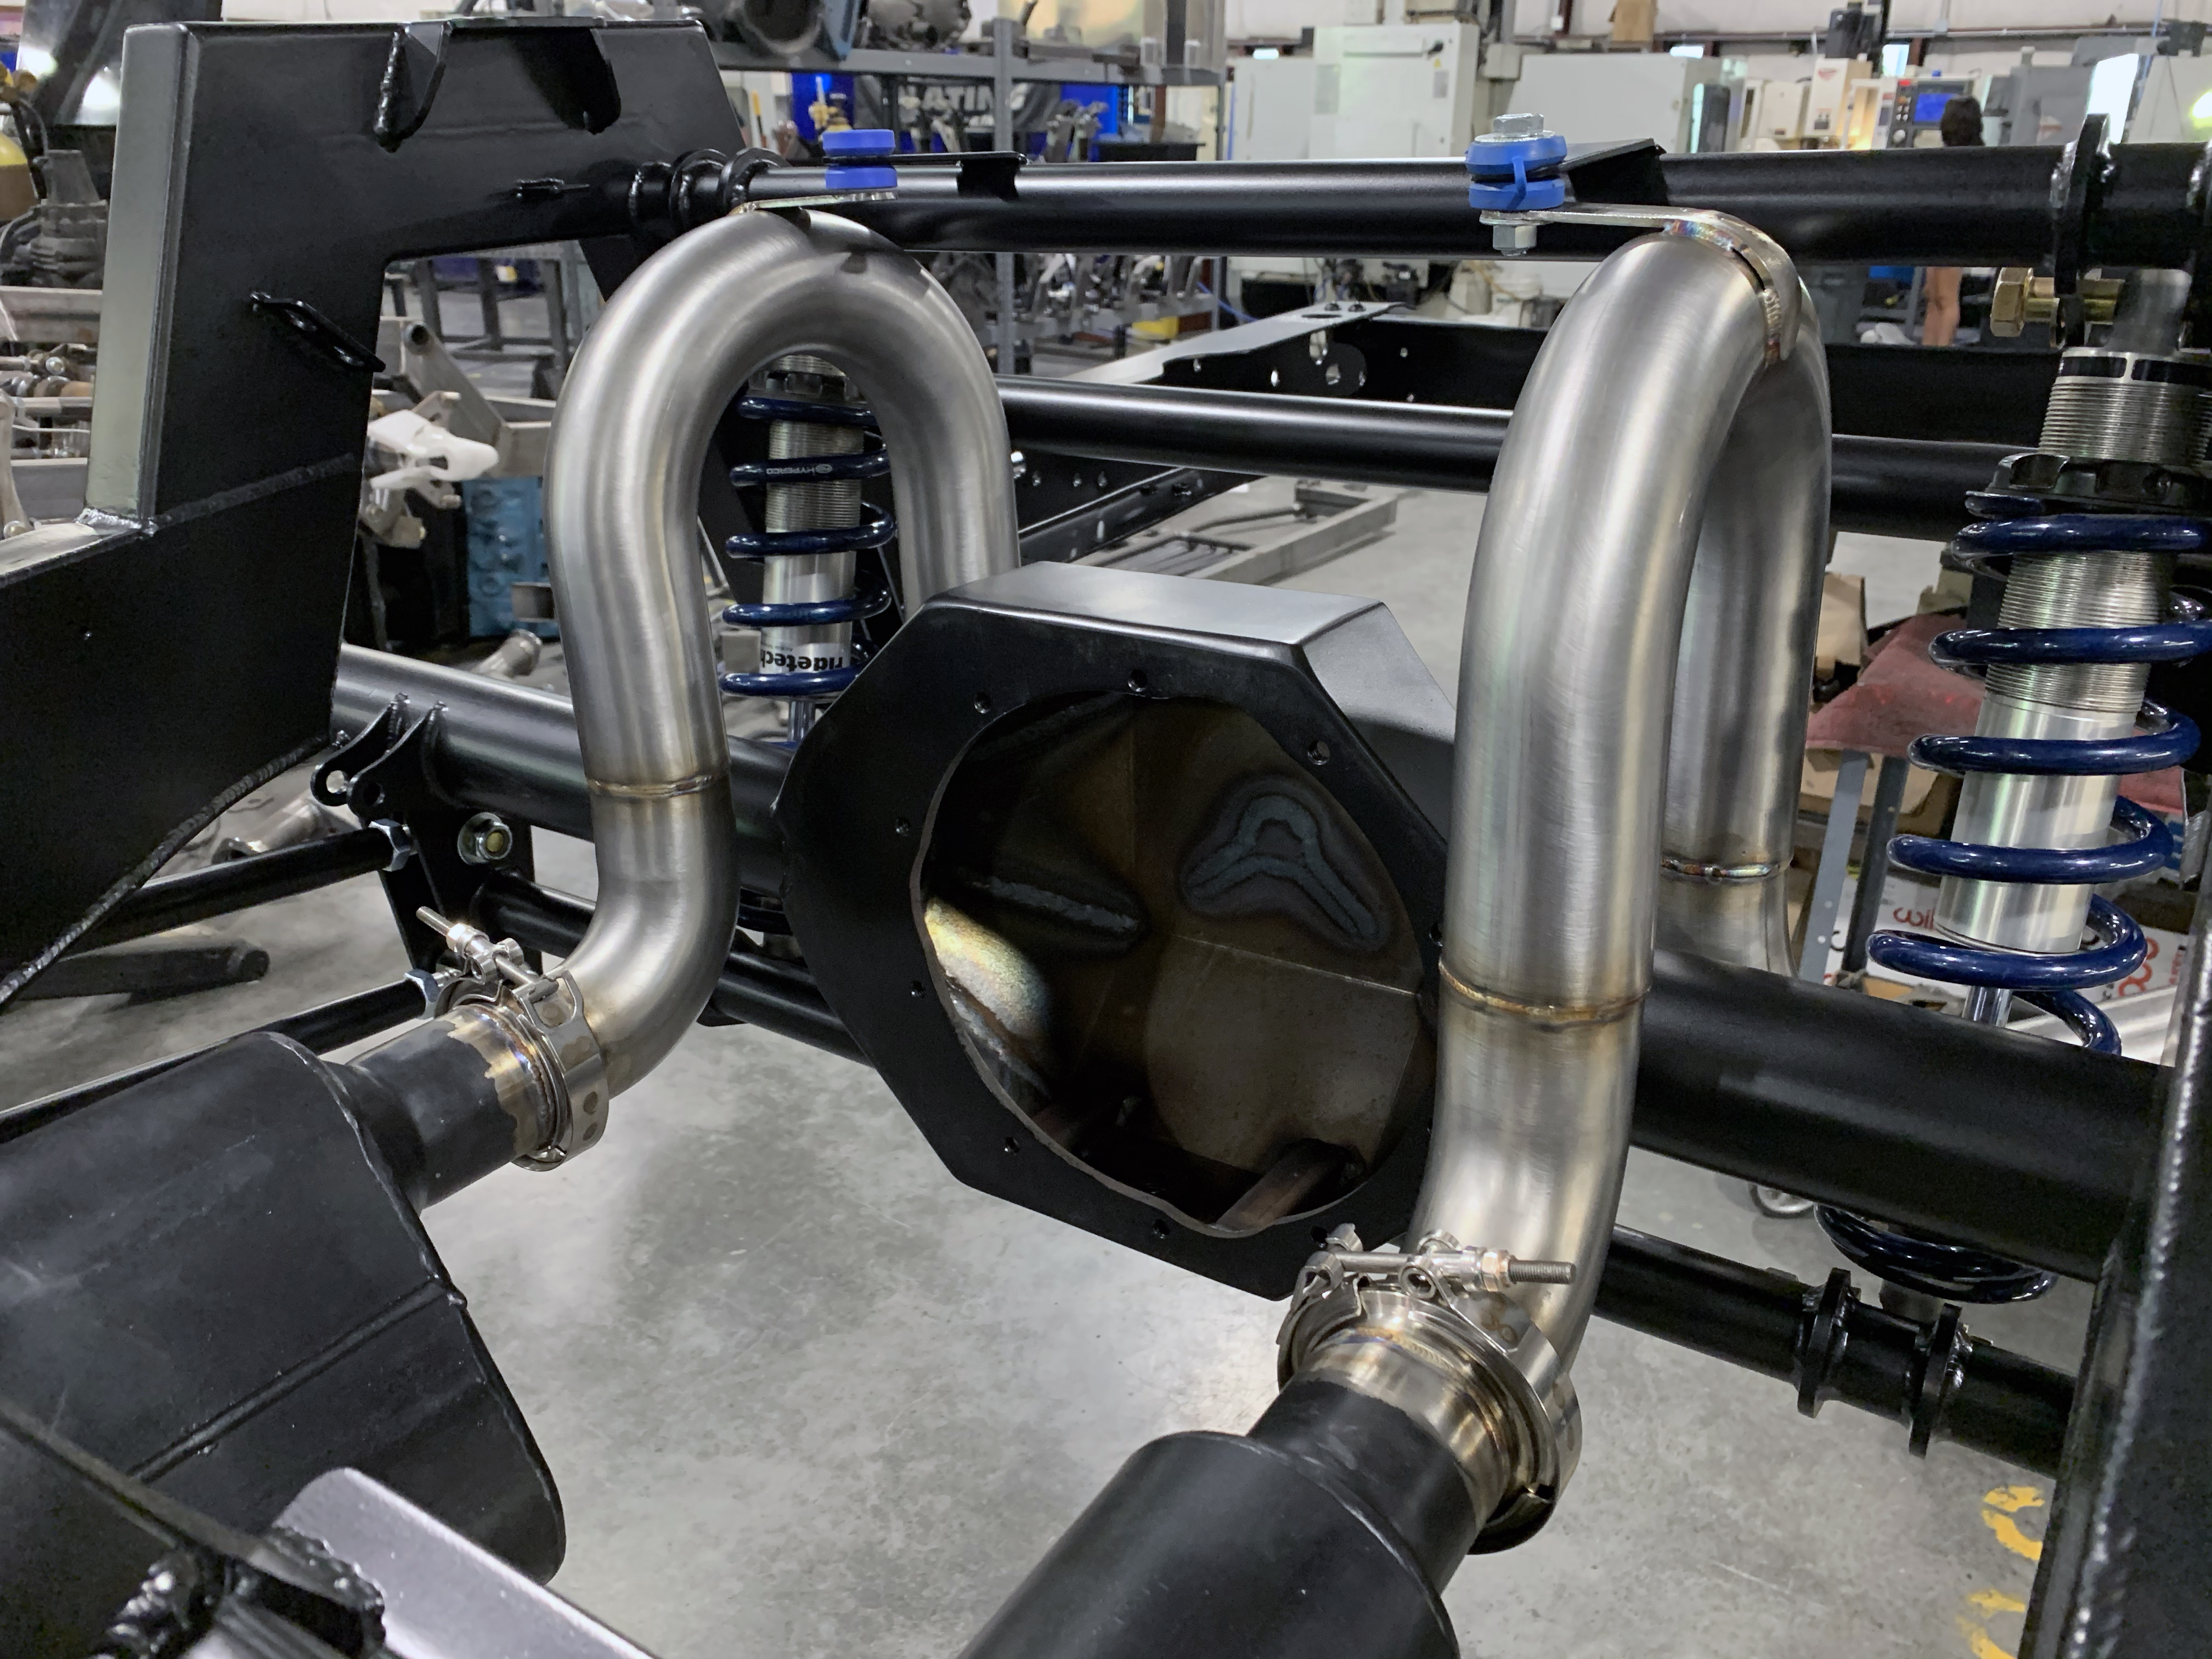 Scotts-Hotrods-82-C10-Blazer-2WD-22